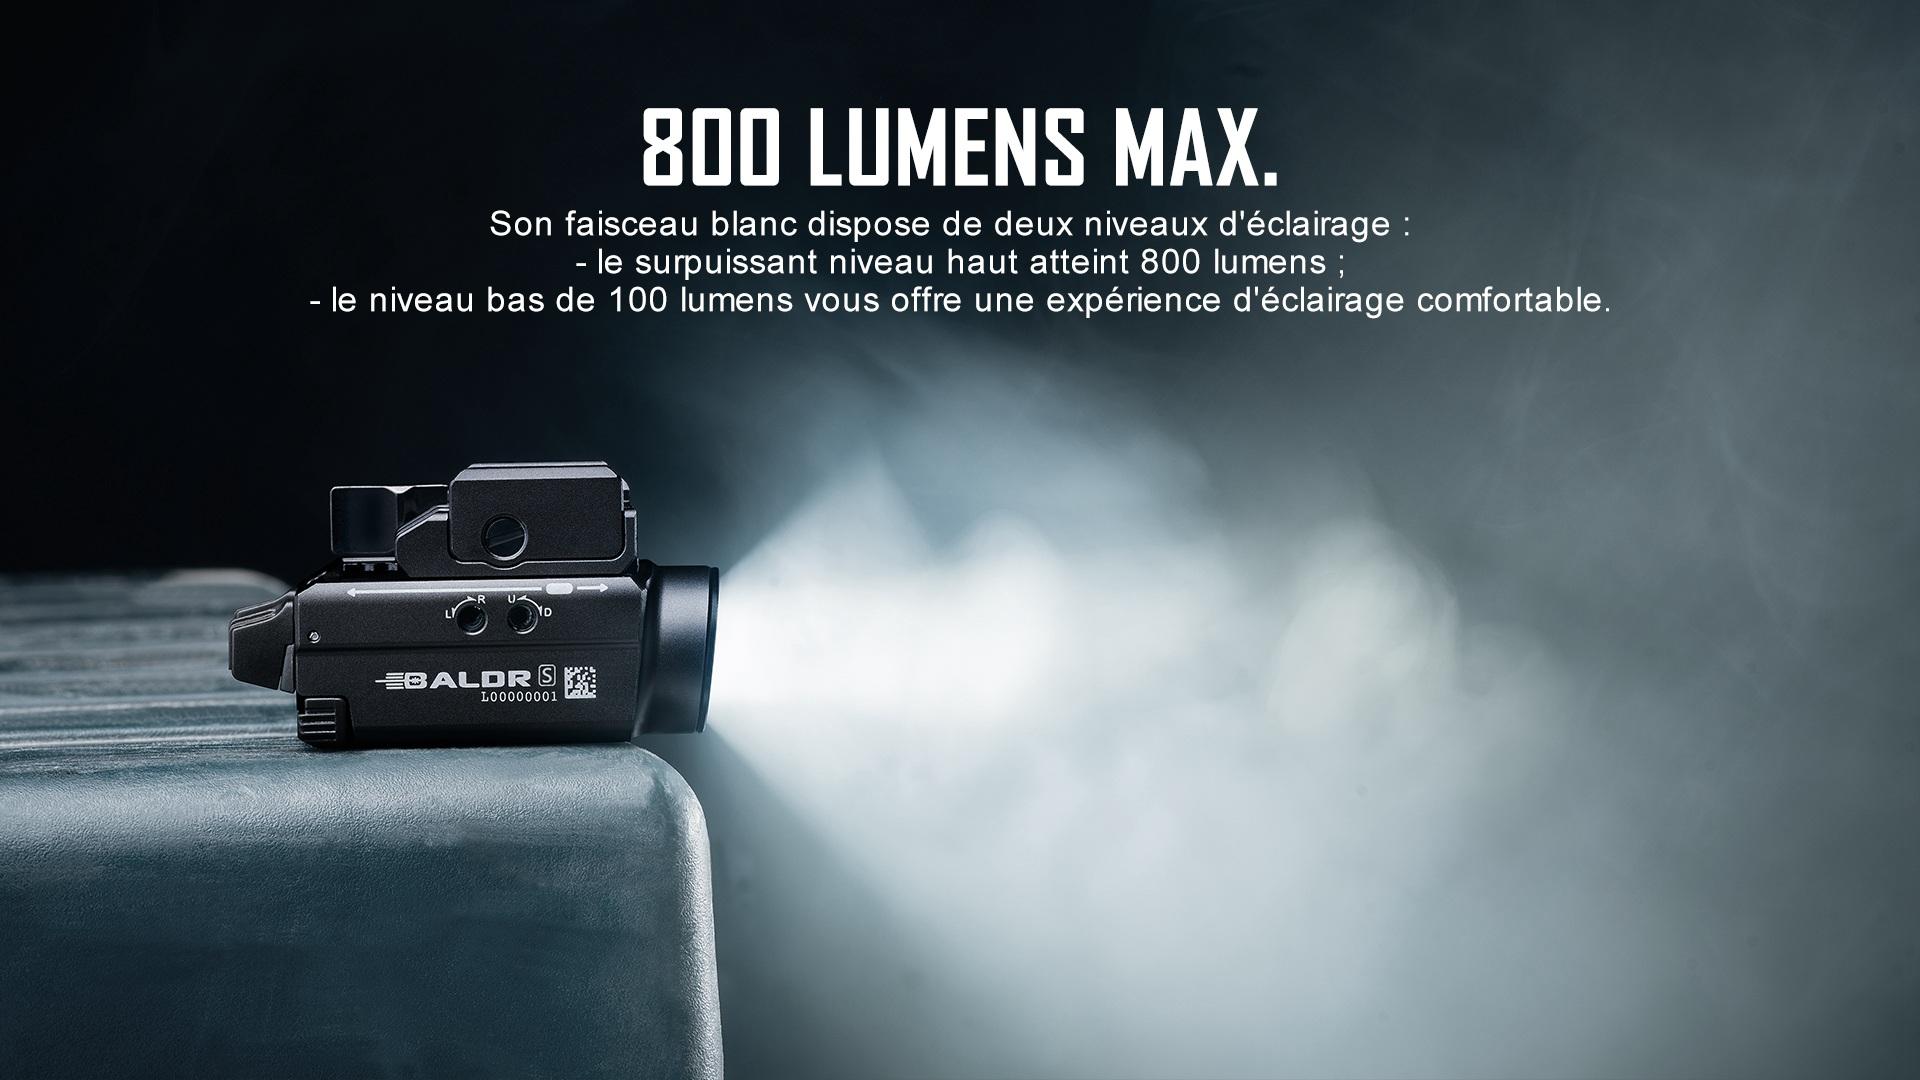 lampe rail picatinny glock 800 lumens